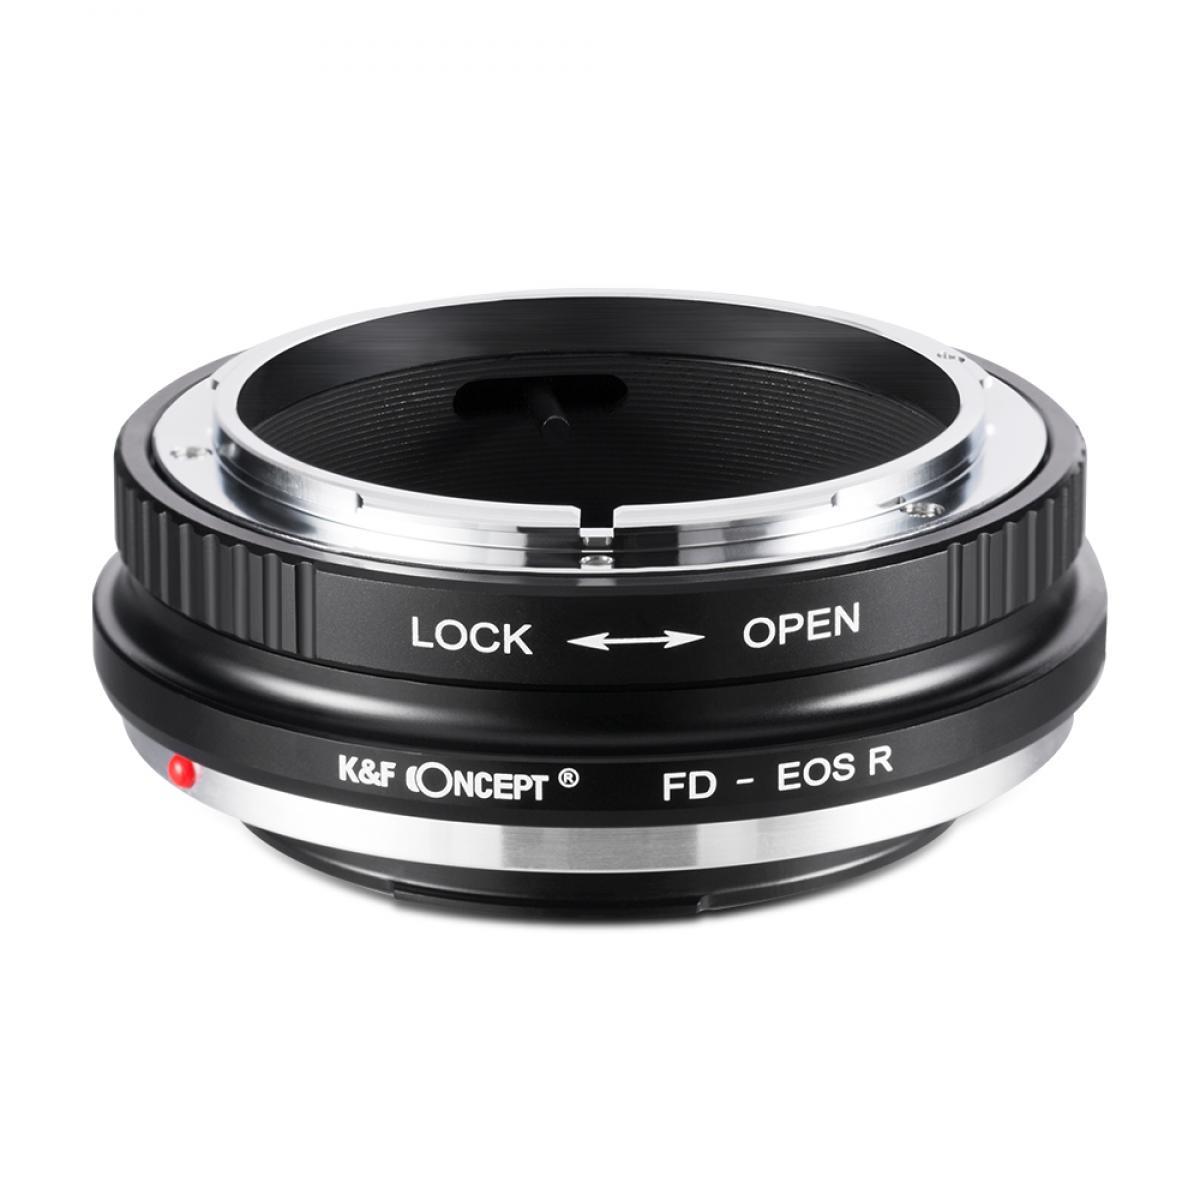 LR-rf objetivamente adaptador Leica R objetivamente a Canon EOS R cámara eosr RF adaptador